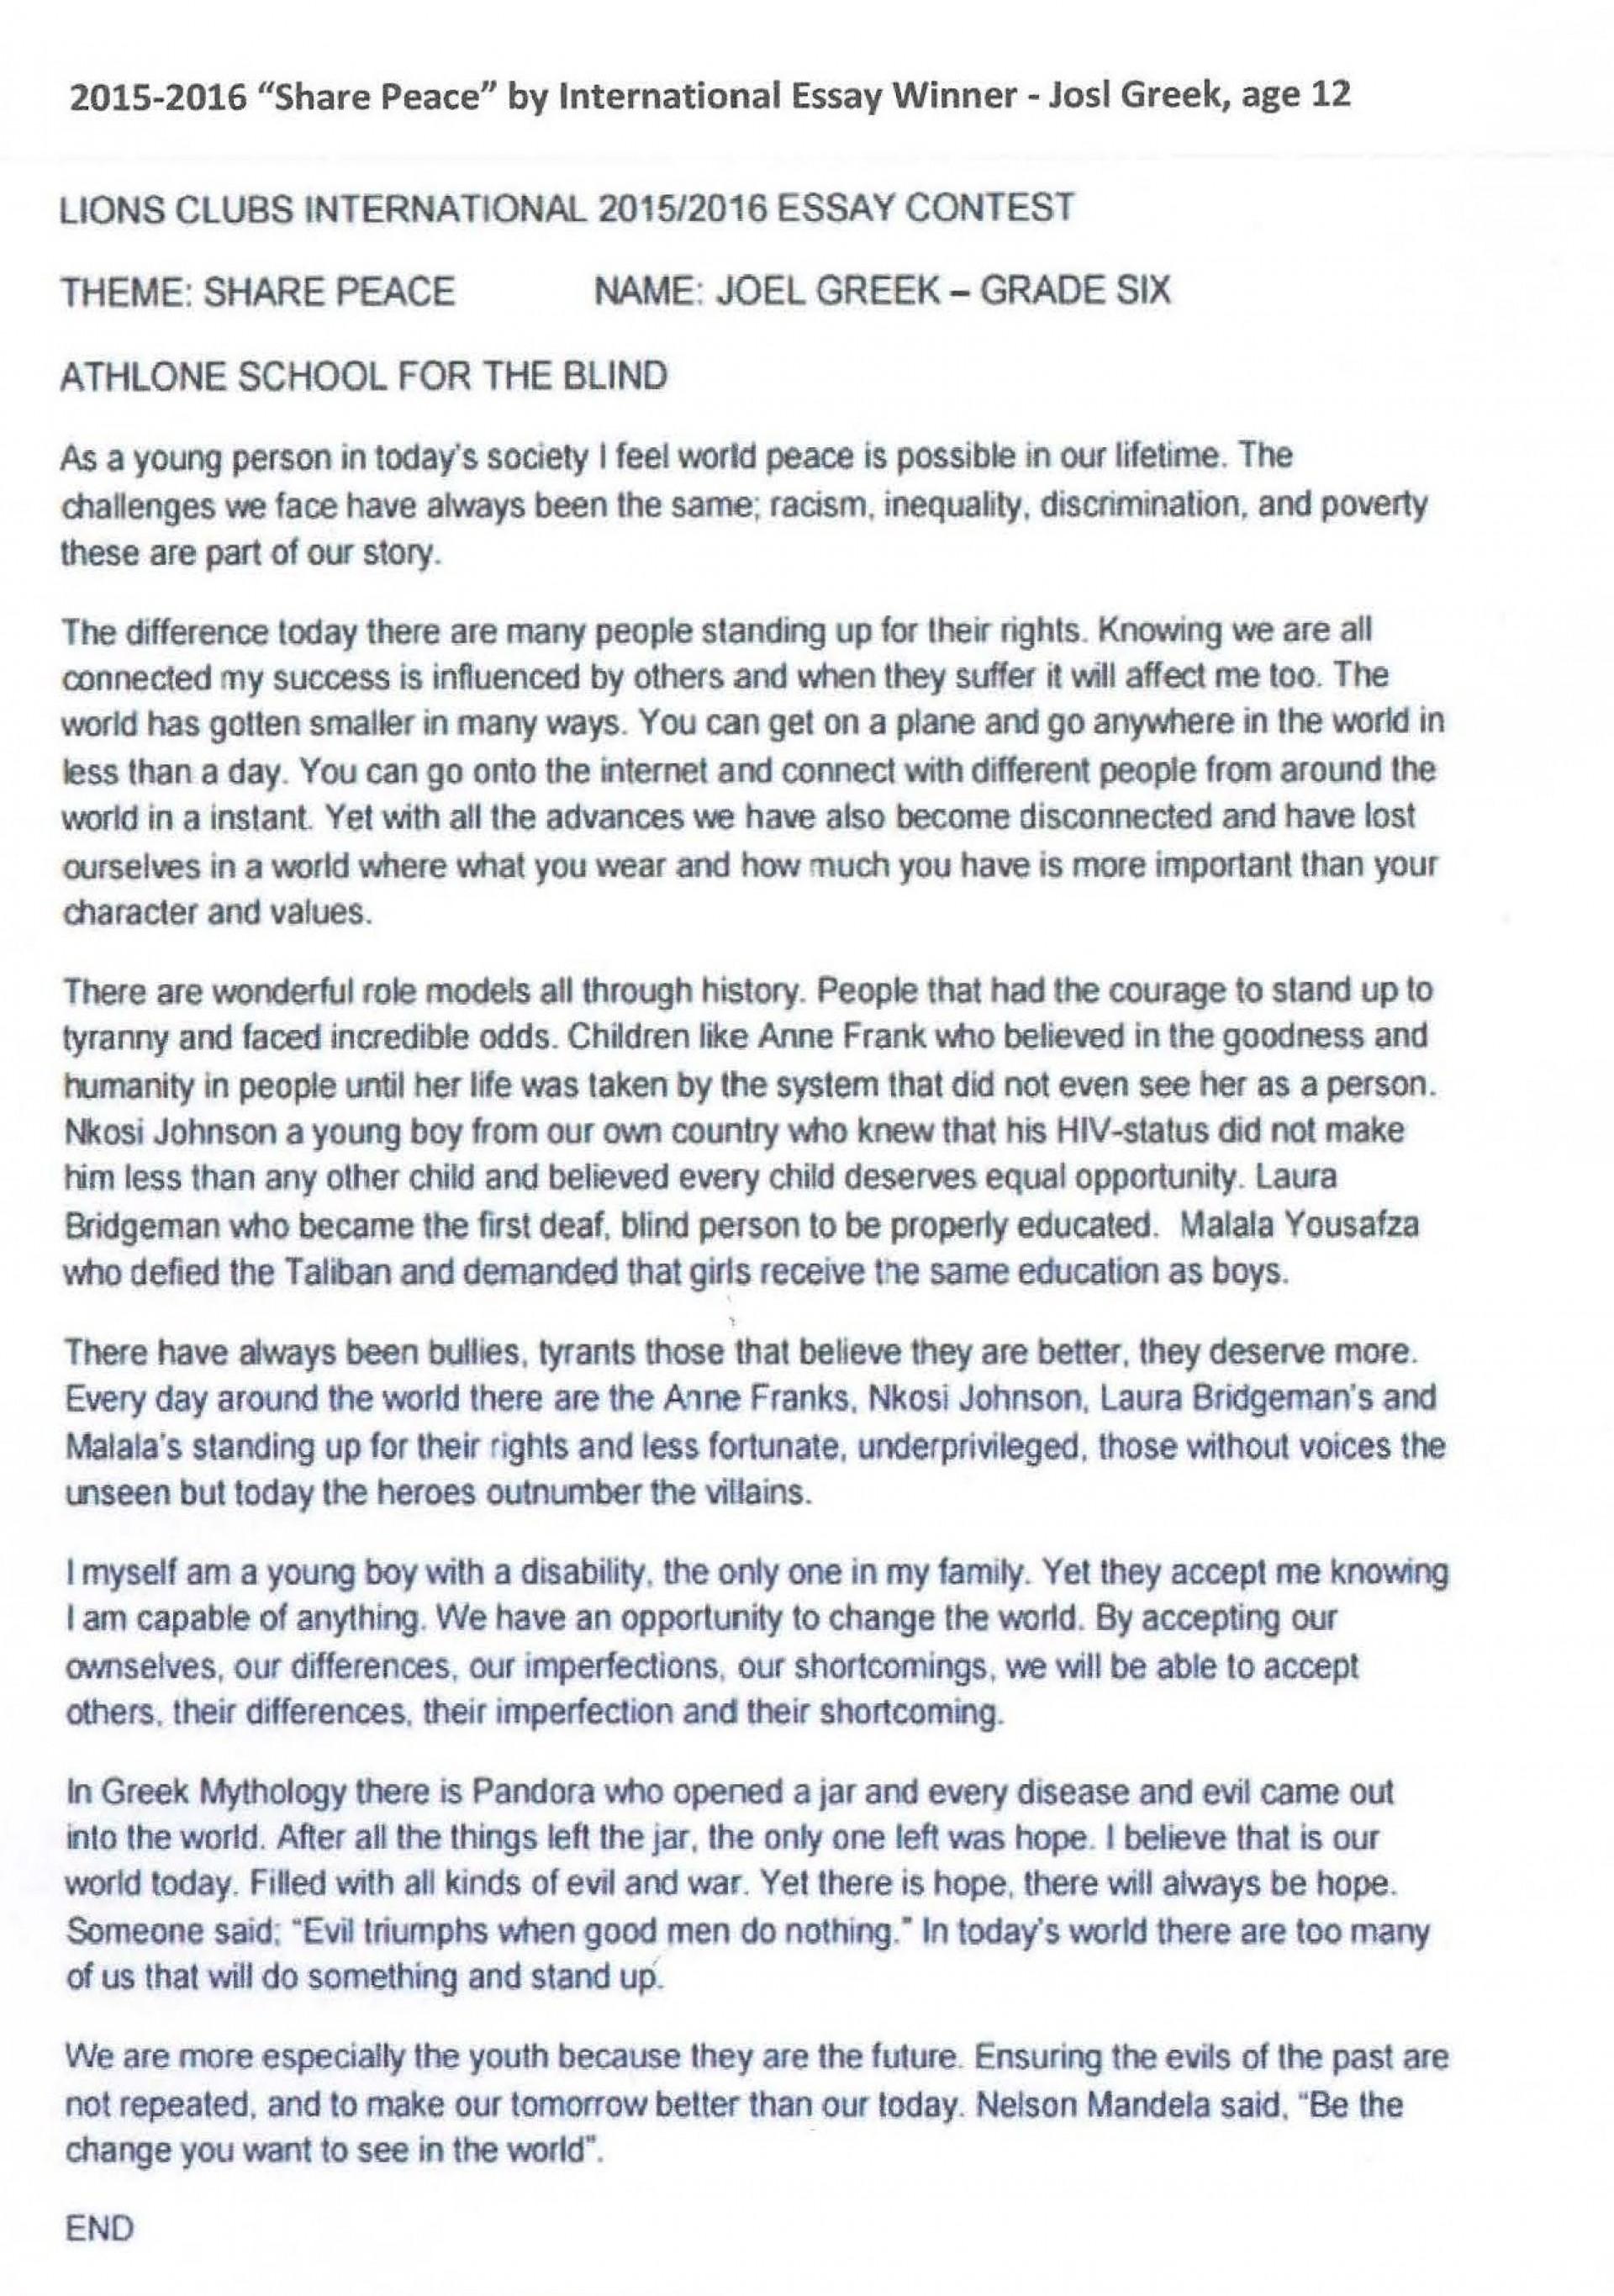 002 Essay Contest Winner If I Were Blind Singular 1920